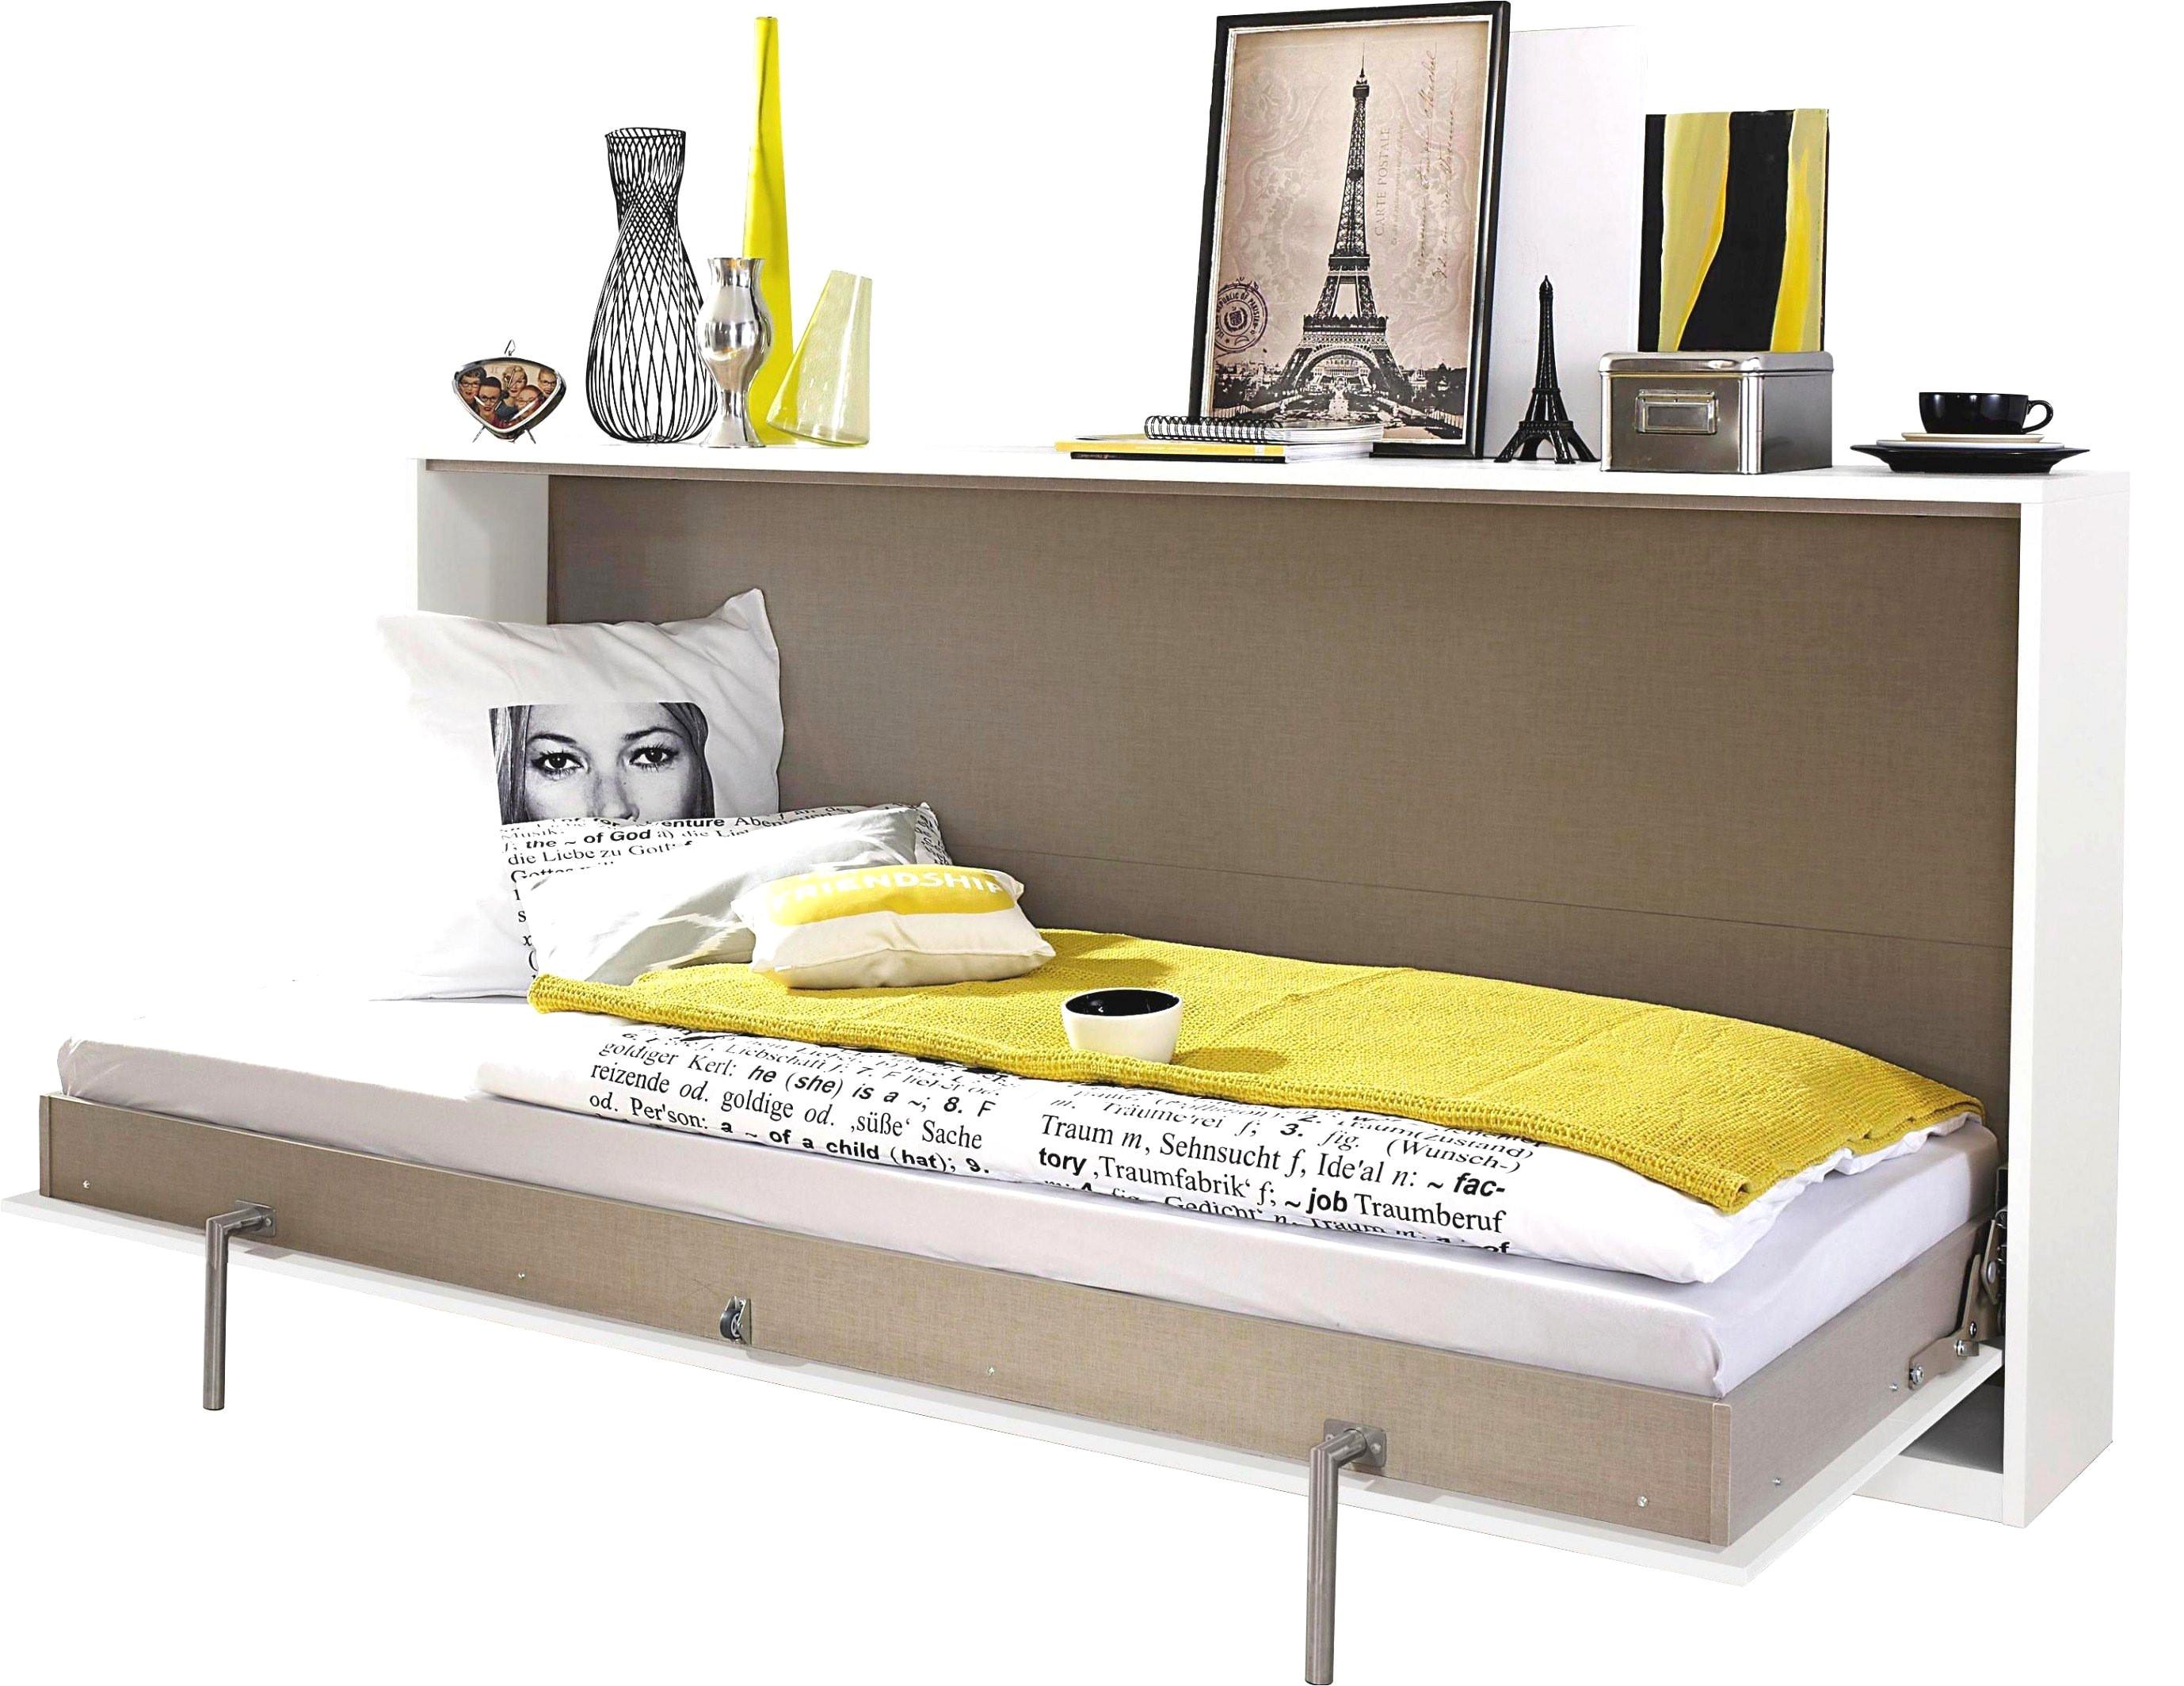 gallery of futon matratze ikea einzigartig matratze alles muss raus fjellse bed frame fjellse bed